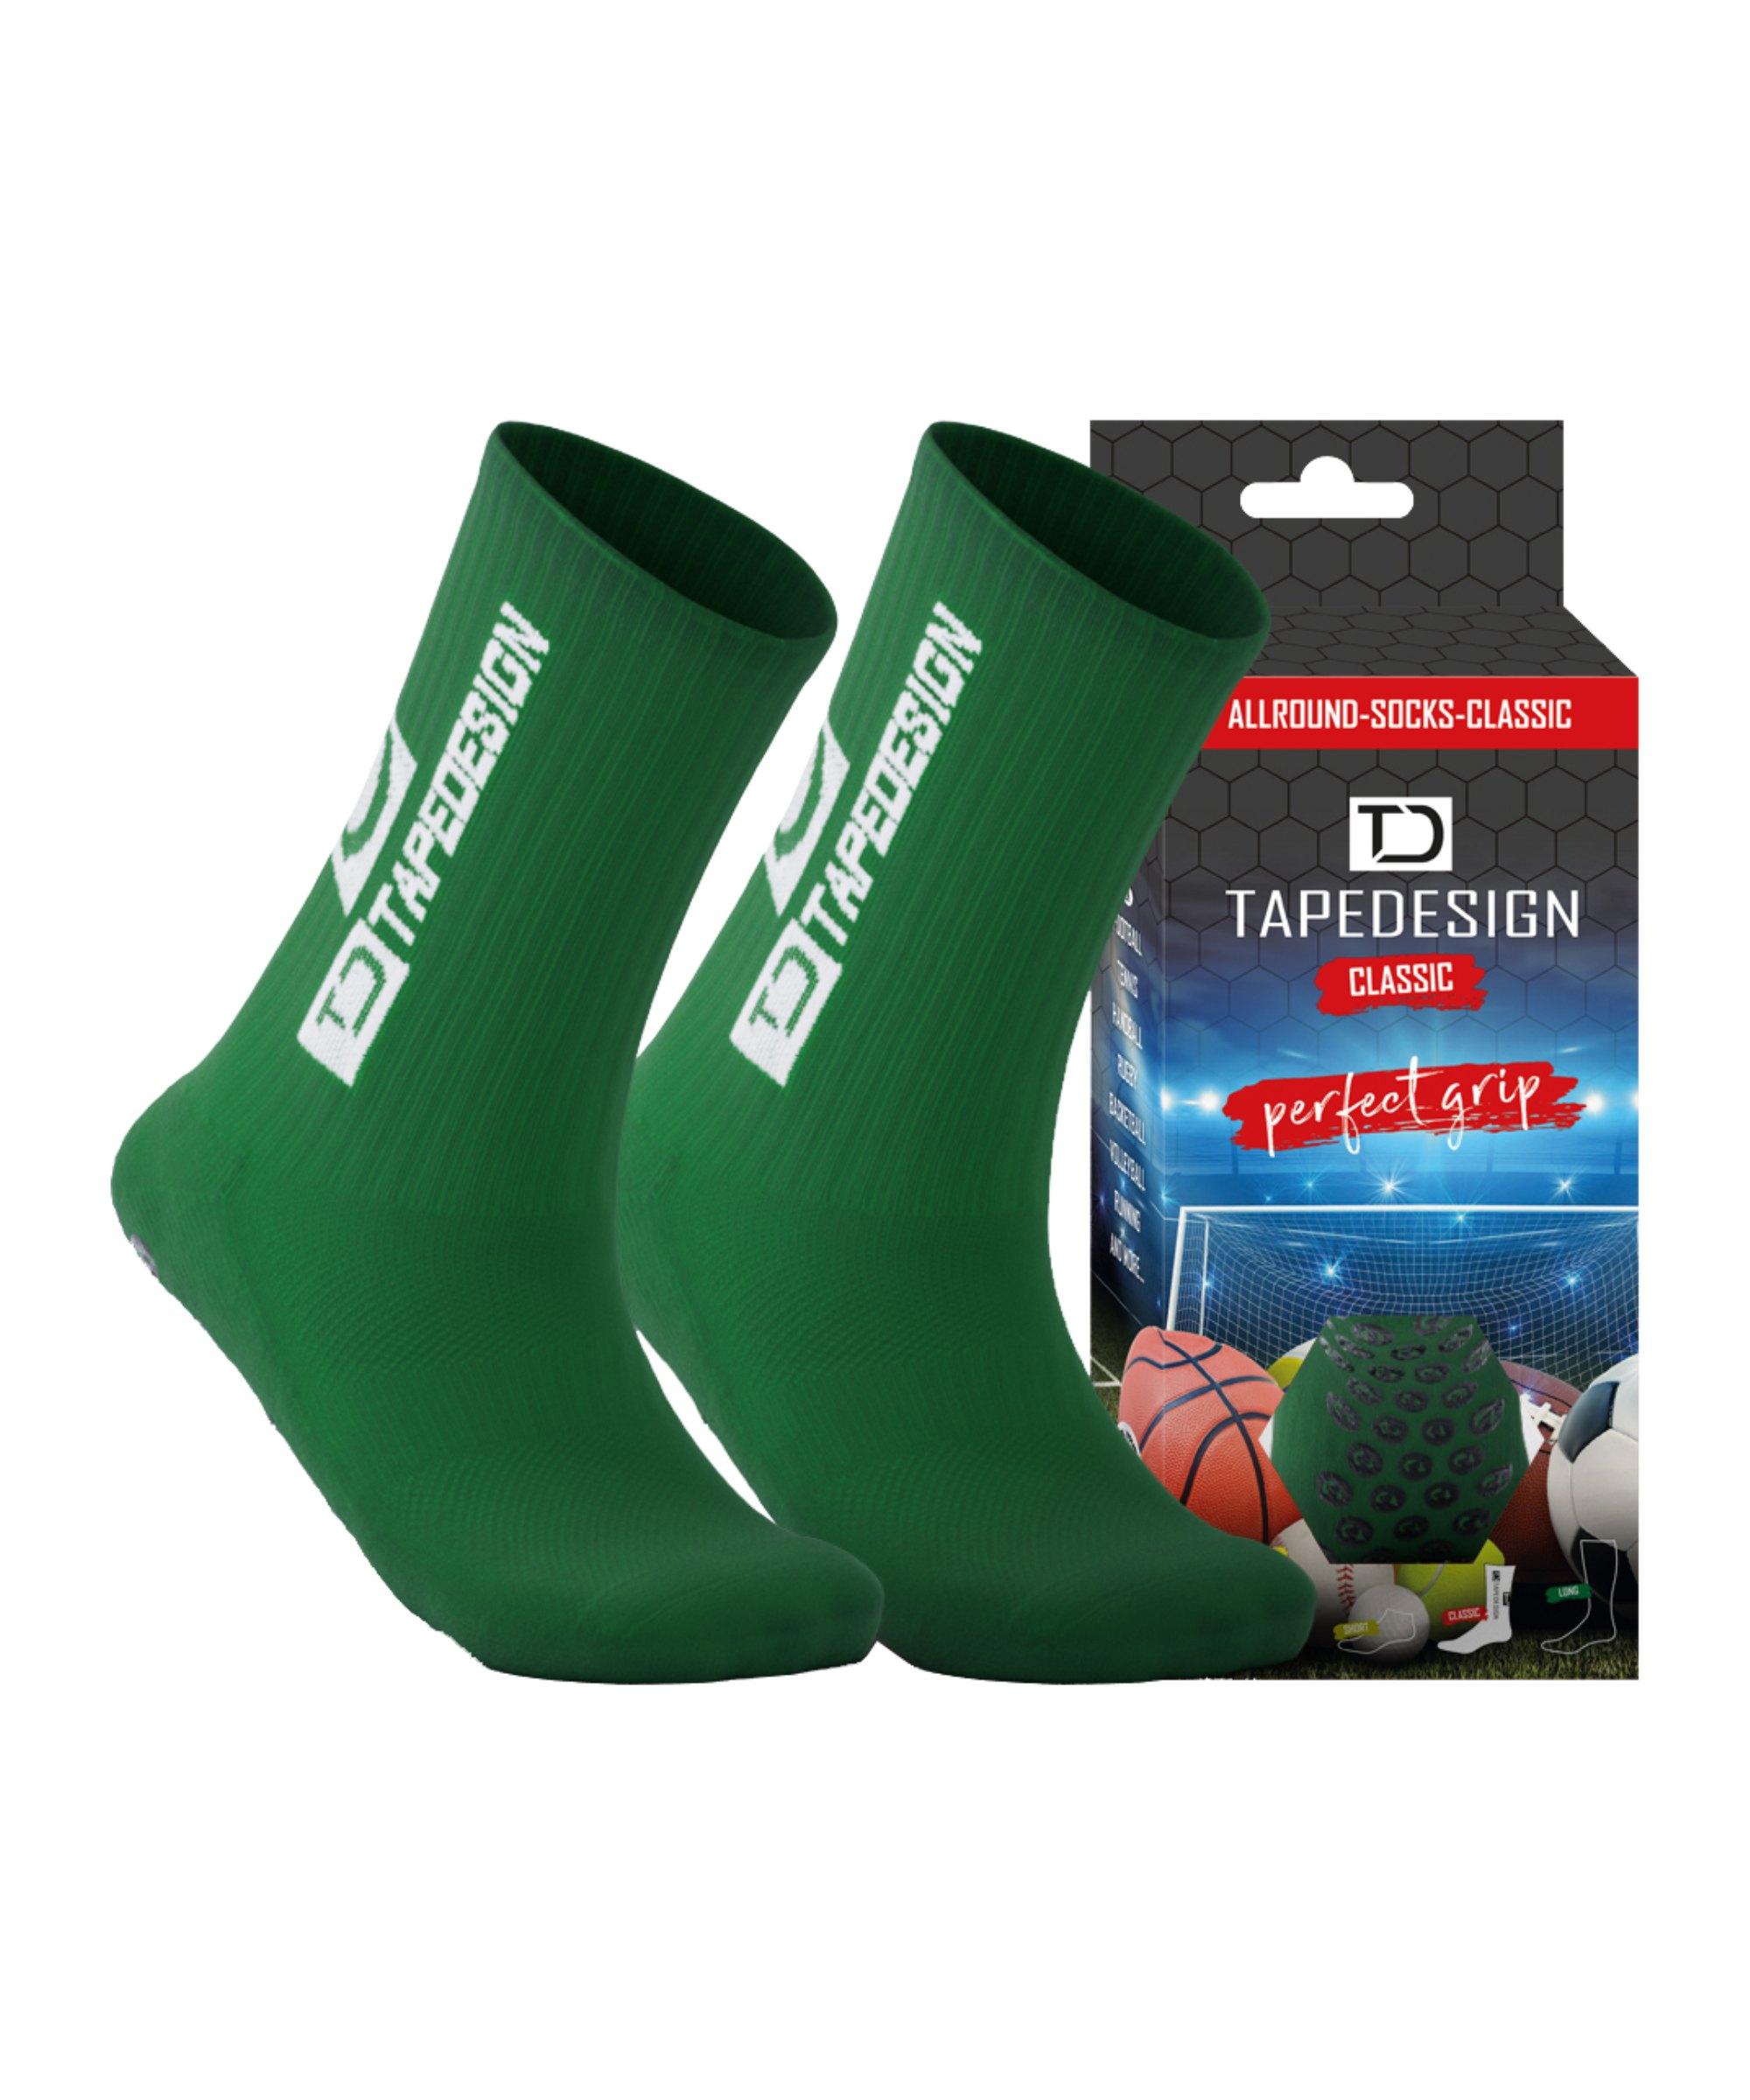 Tapedesign Socks Socken Grün F007 - gruen